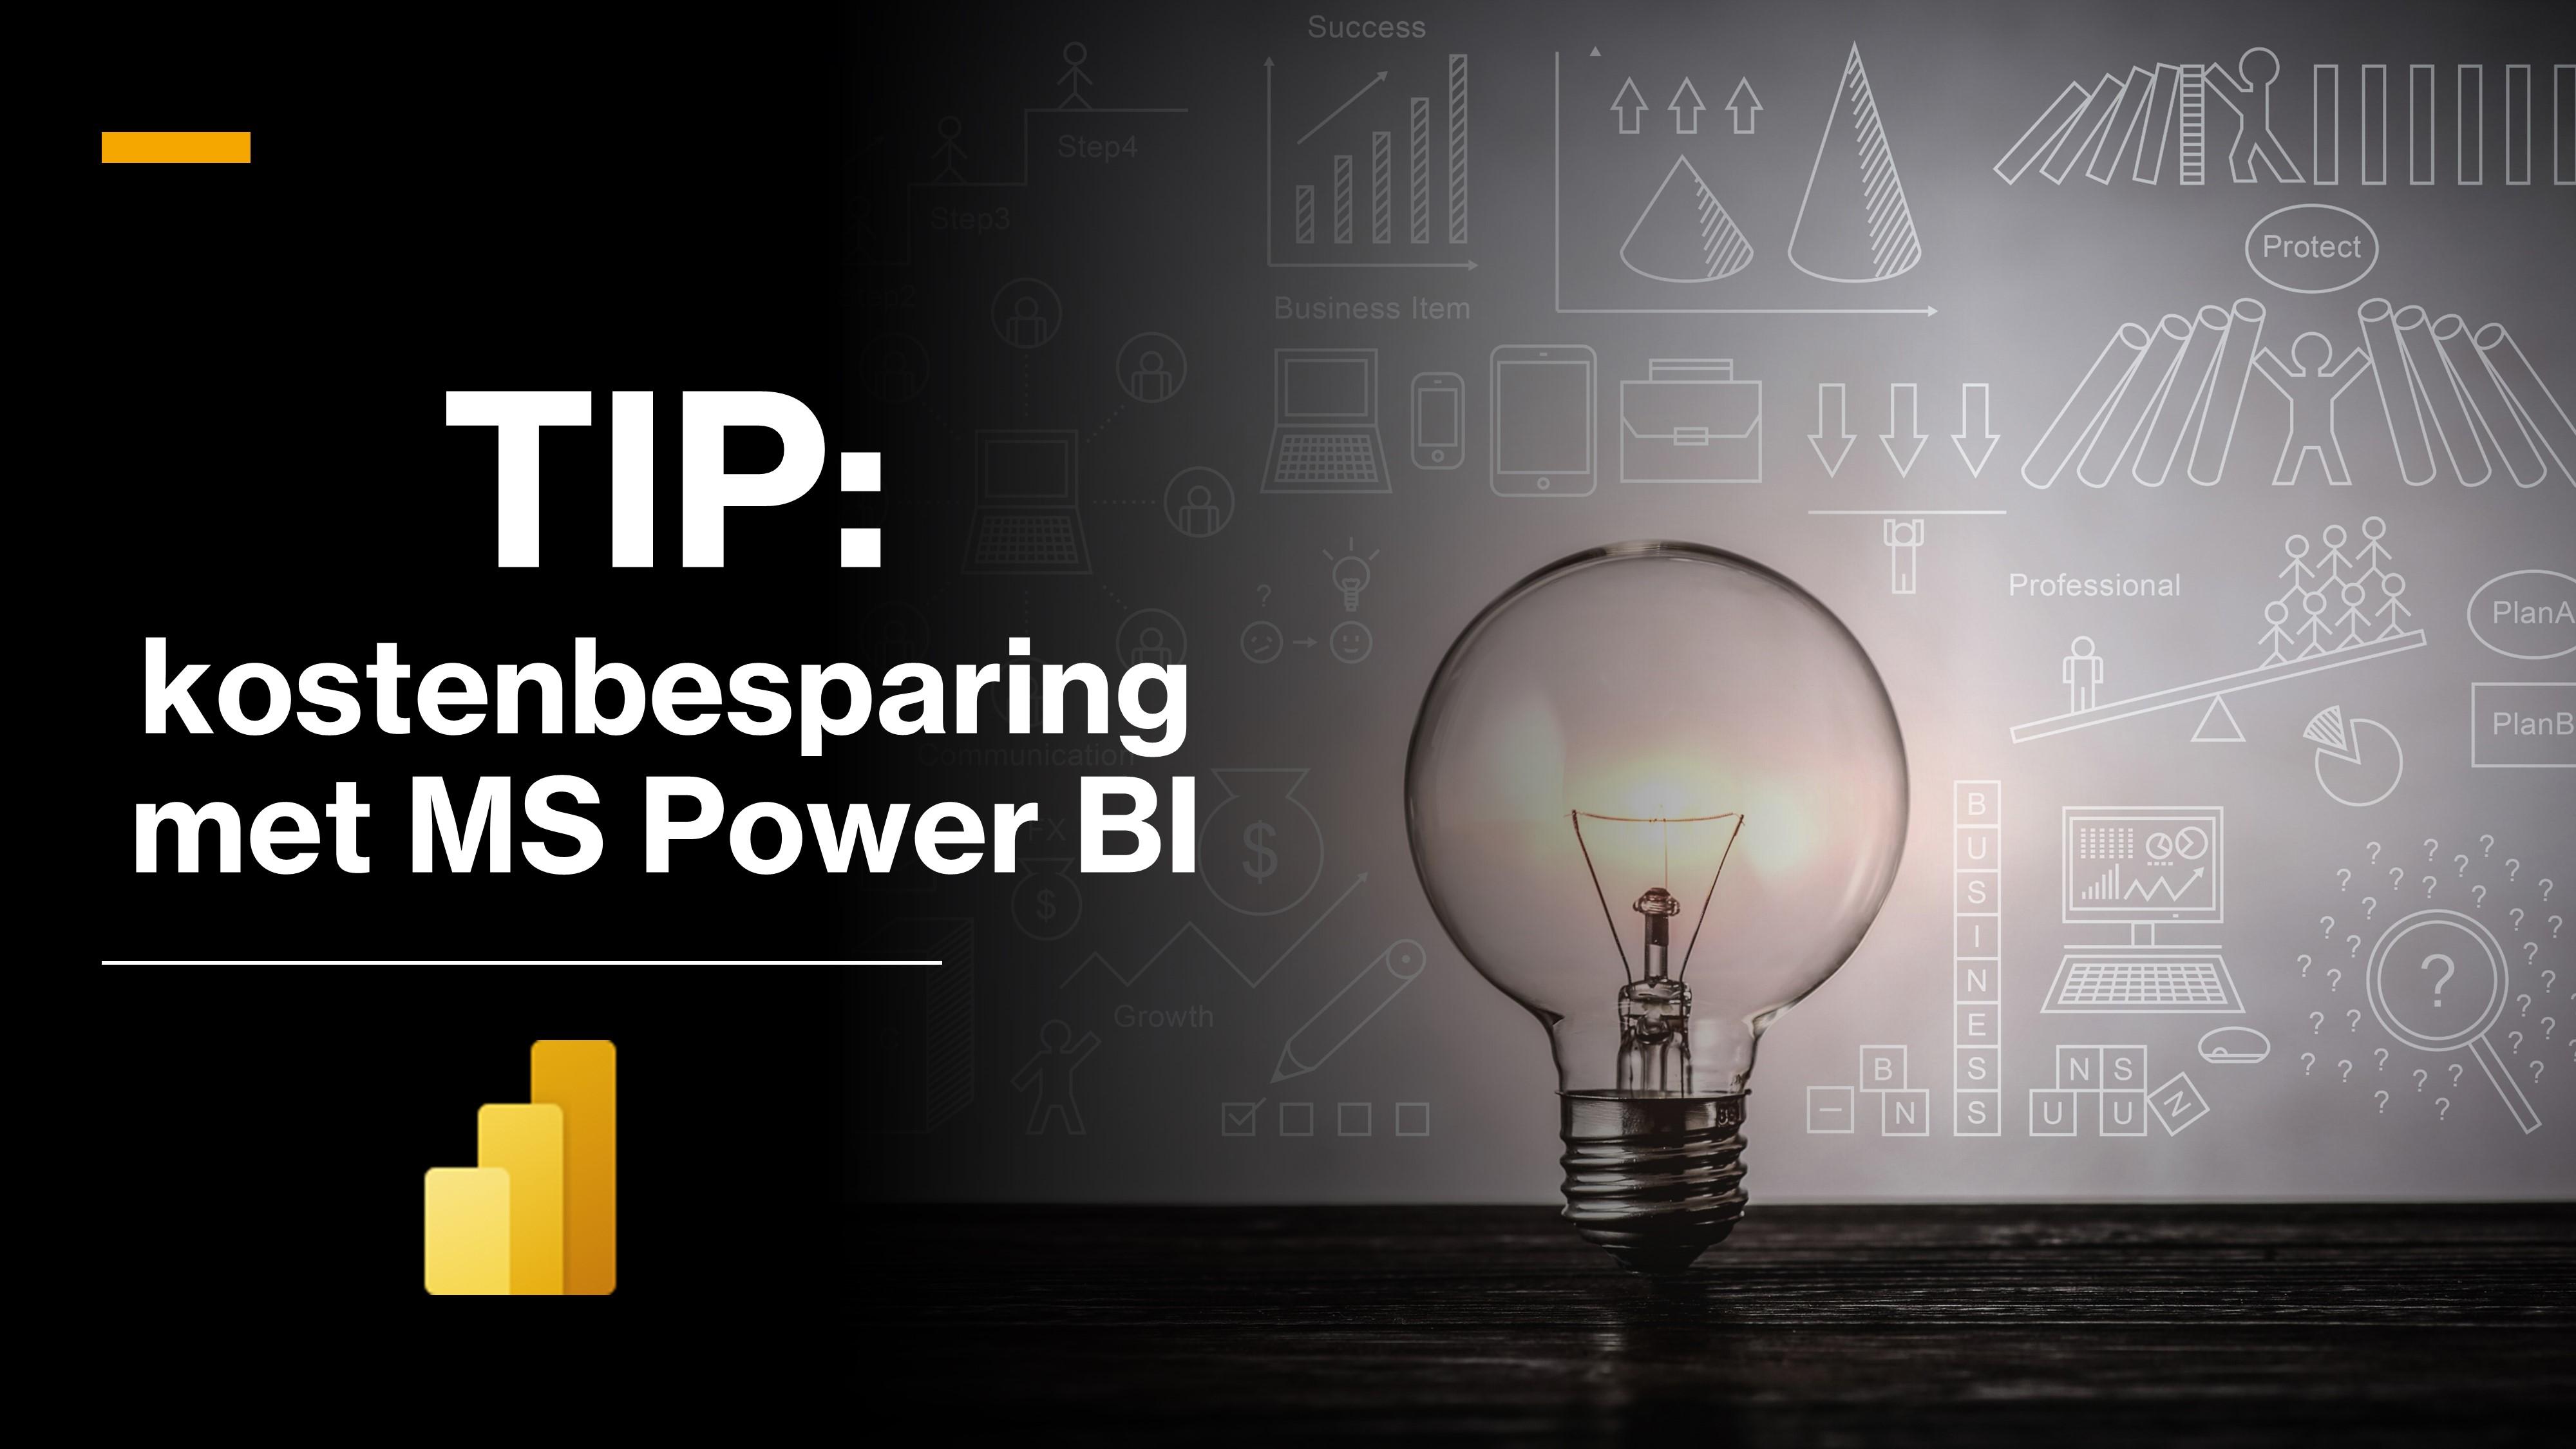 Power BI: Resultaat door Inzicht in Data. BI consultant, kpi, performance management, business intelligence, Qlik, PowerBI, Tableau